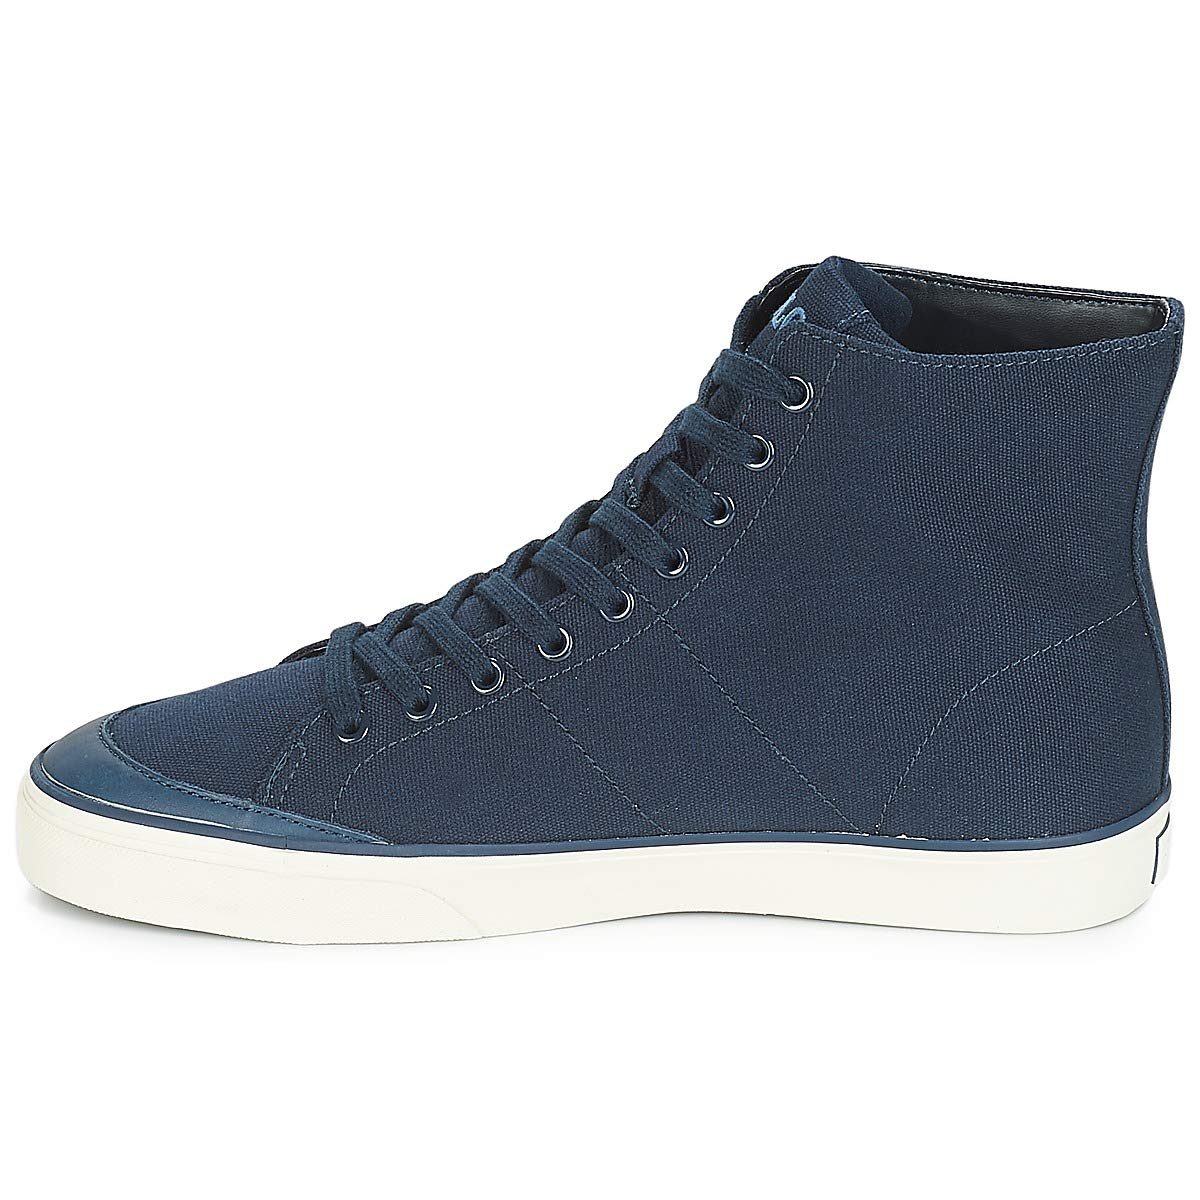 Ralph Lauren Sneaker Uomo  Amazon.it  Scarpe e borse 968ee2f2cbe